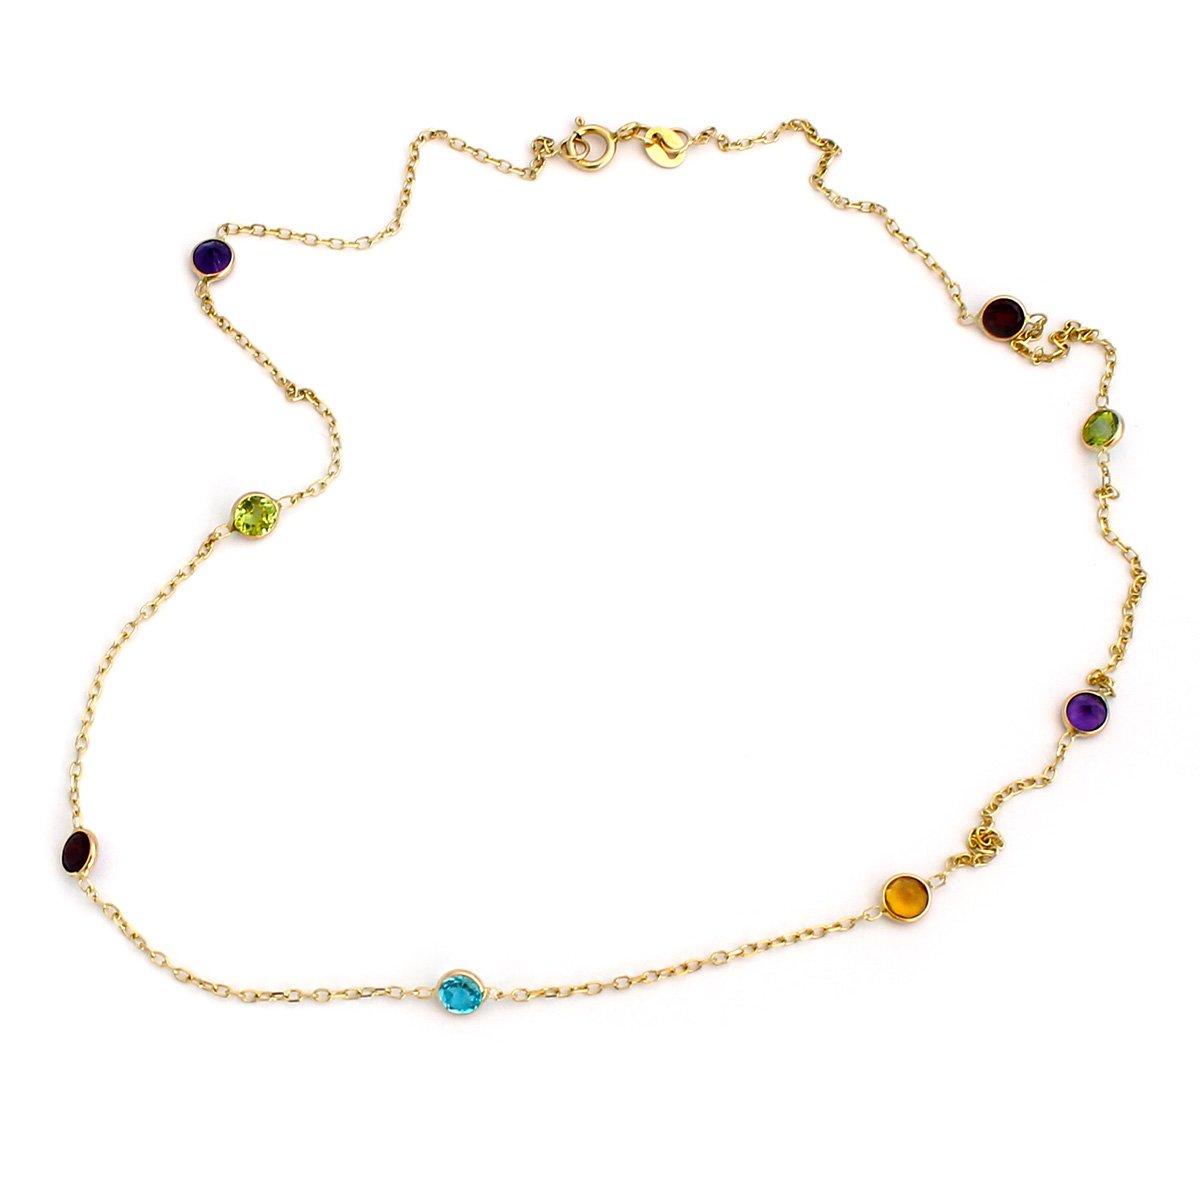 14k Yellow Gold Bezel Set Natural Gemstones Station Necklace, 16'' by Beauniq (Image #1)